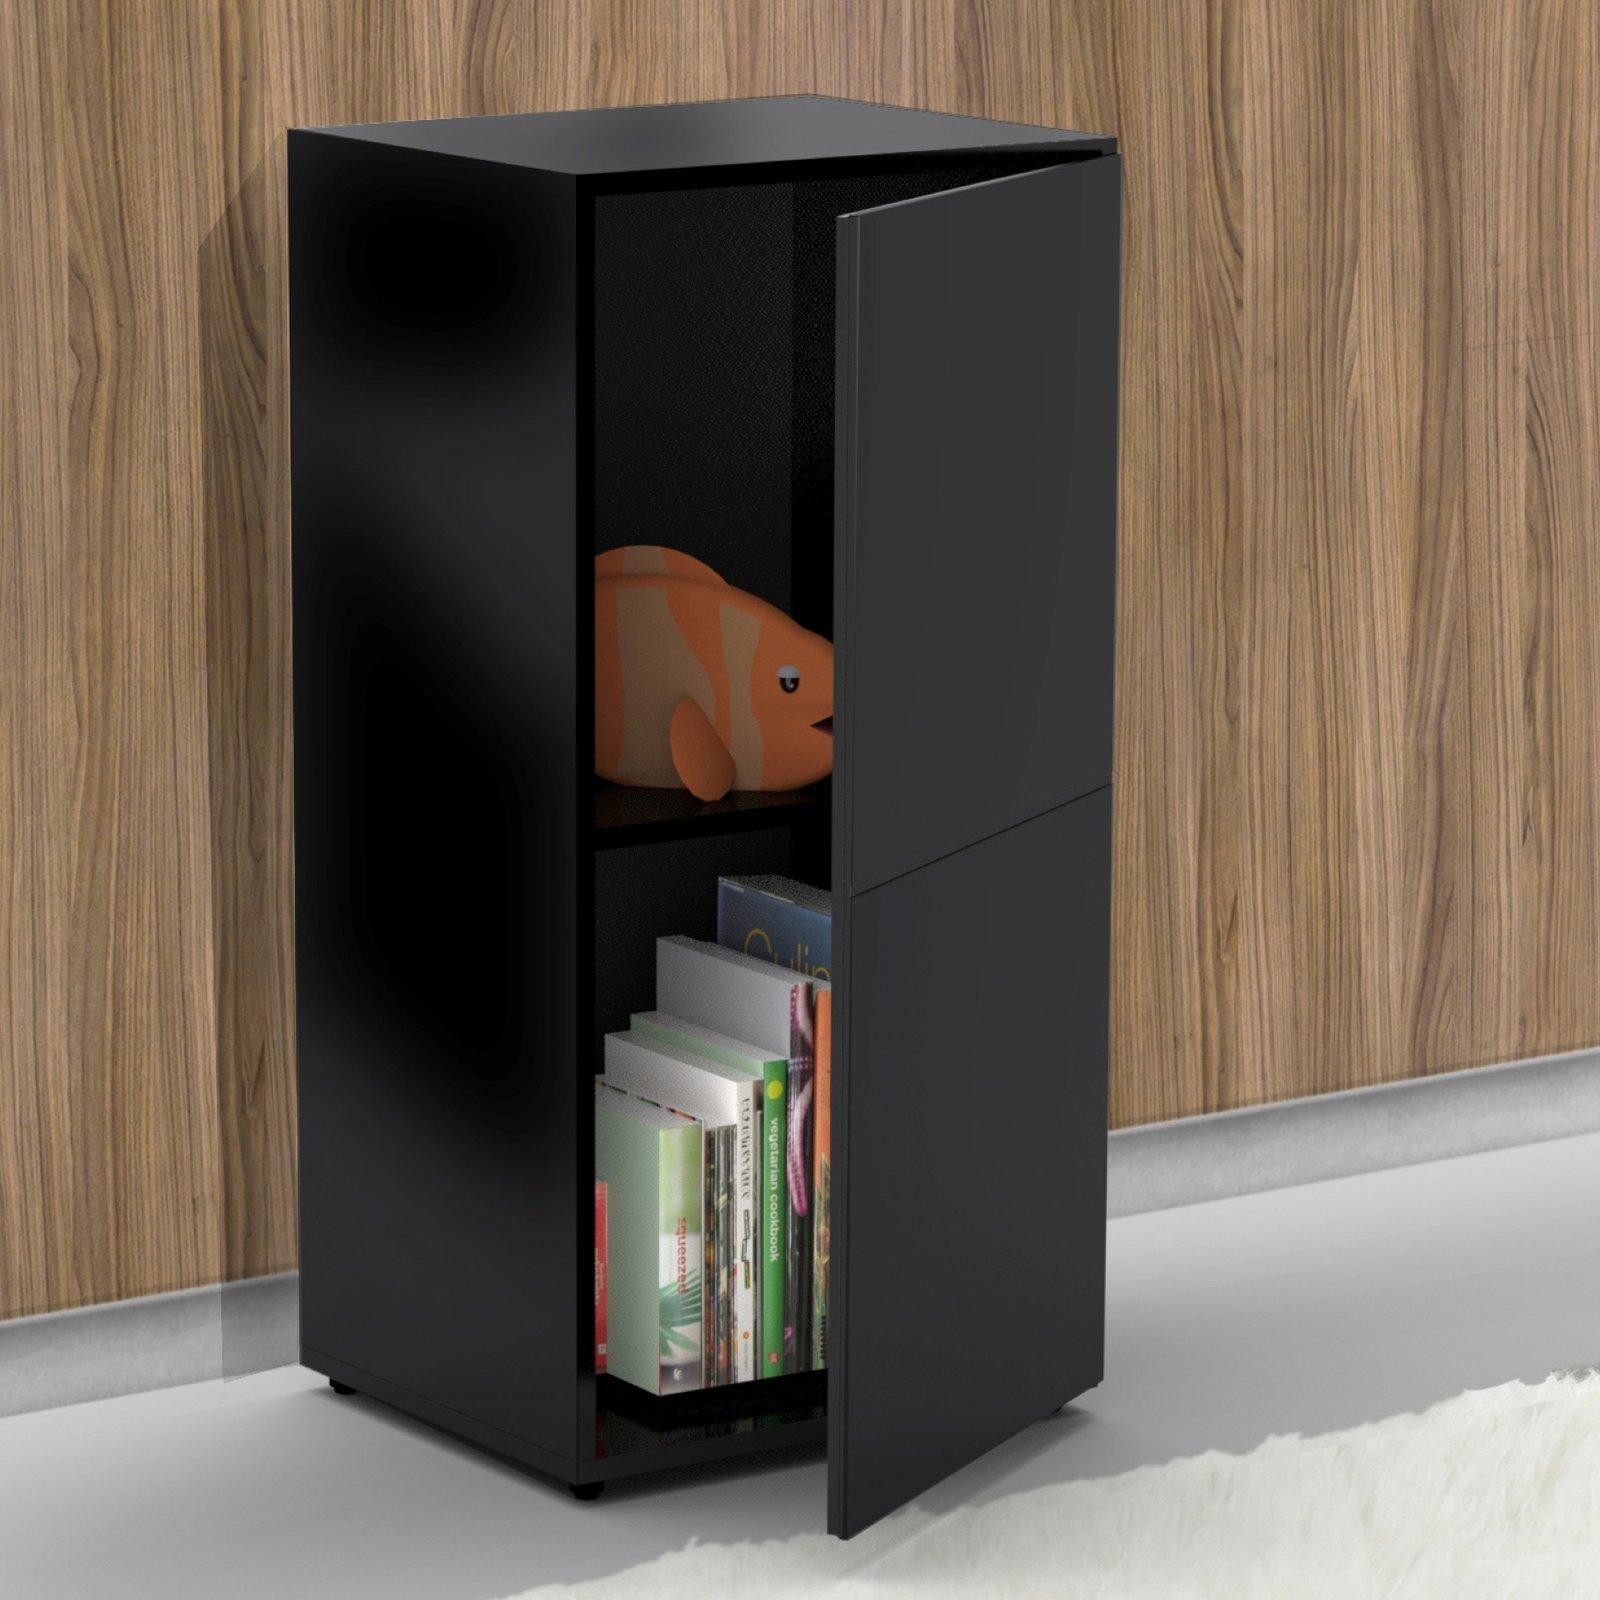 Bookcase in Modern/Contemporary Style Black Avenue 1 Door Storage Book Shelf - 18W x 15.5D x 36.75H inches